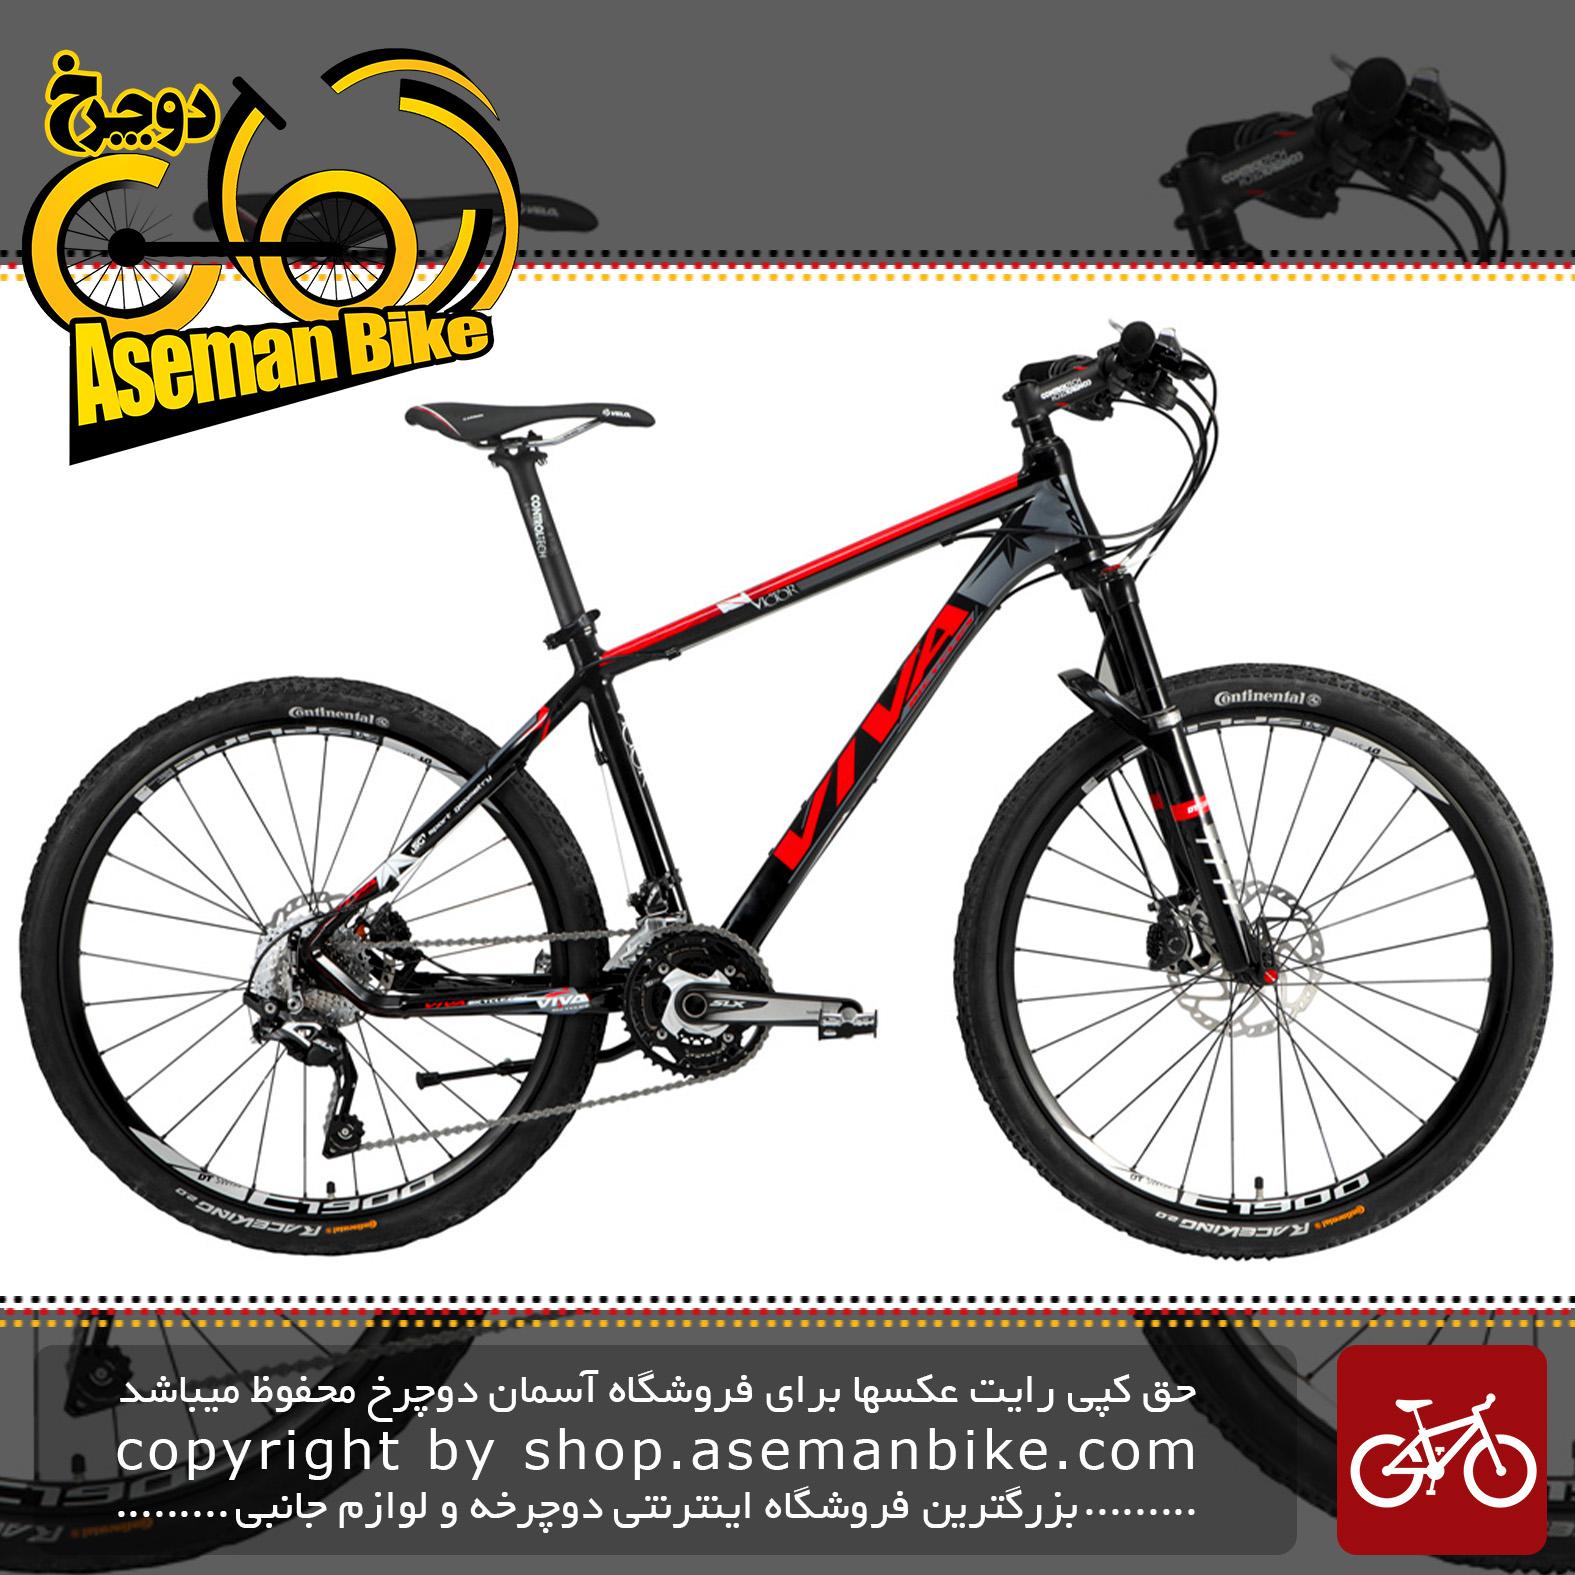 نمایندگی دوچرخه کوهستان ویوا مدل ویکتور سایز Viva Mountain Bicycle Victor 26 2018 26